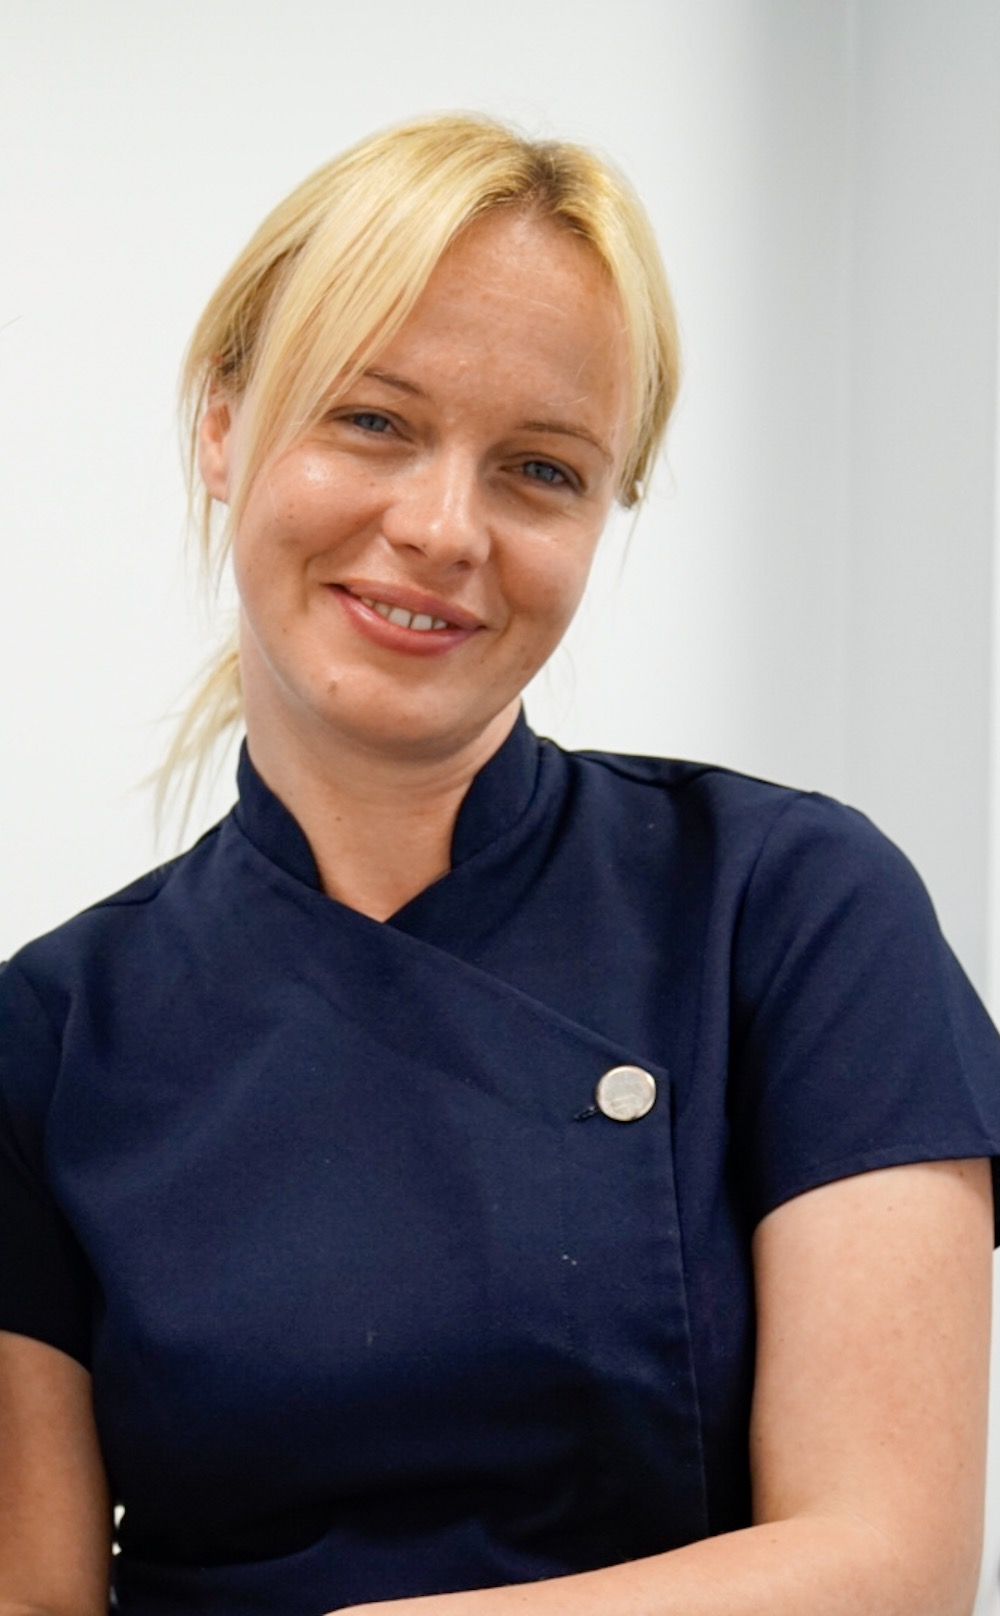 Anna - Qualified Dental Nurse